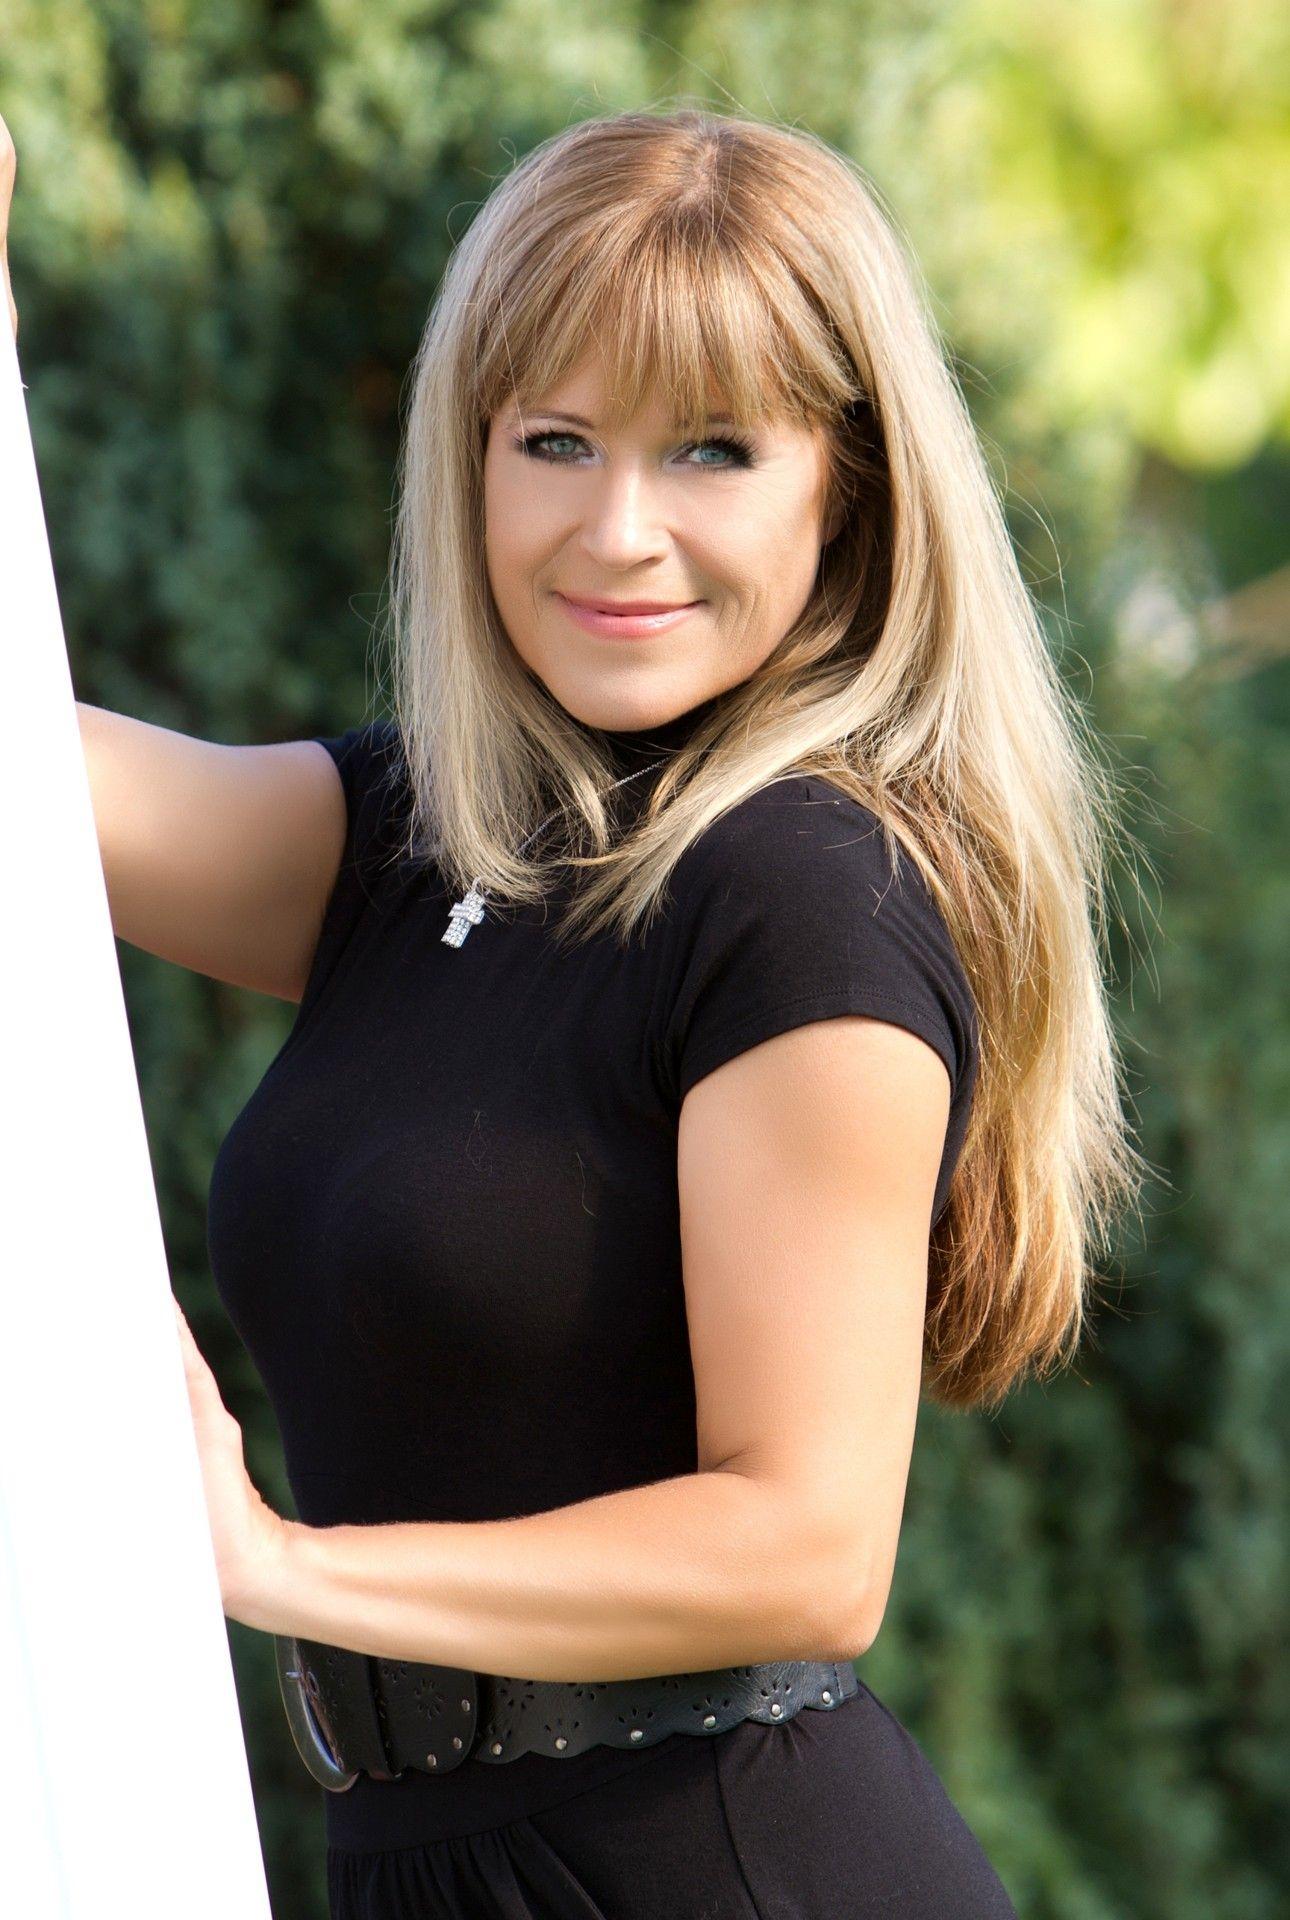 Dating ukraine women forum